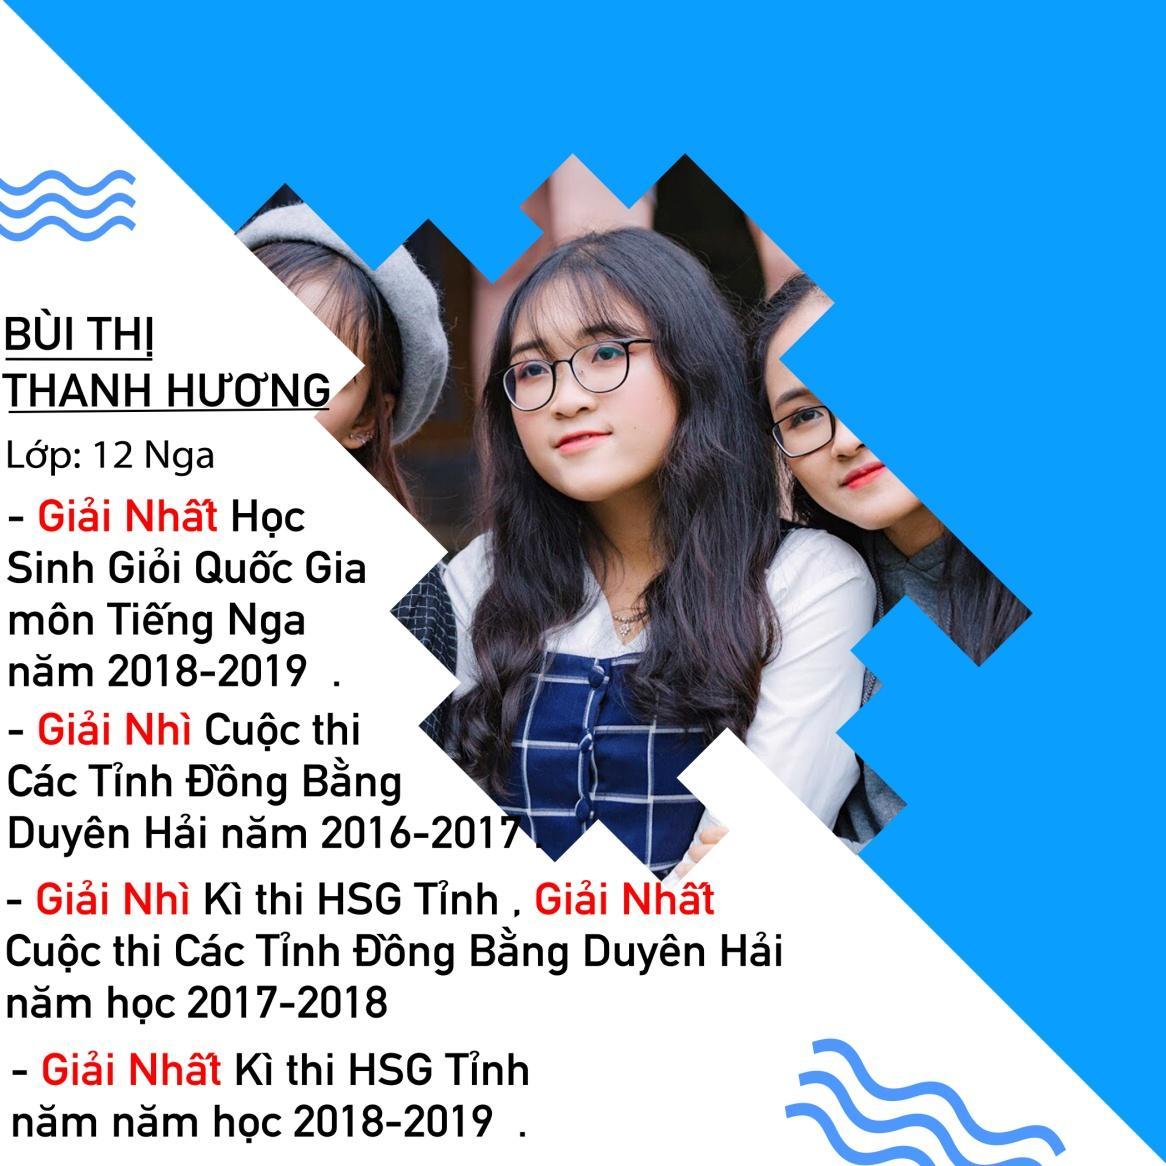 C:\Users\QuangHanh\Downloads\hương.jpg